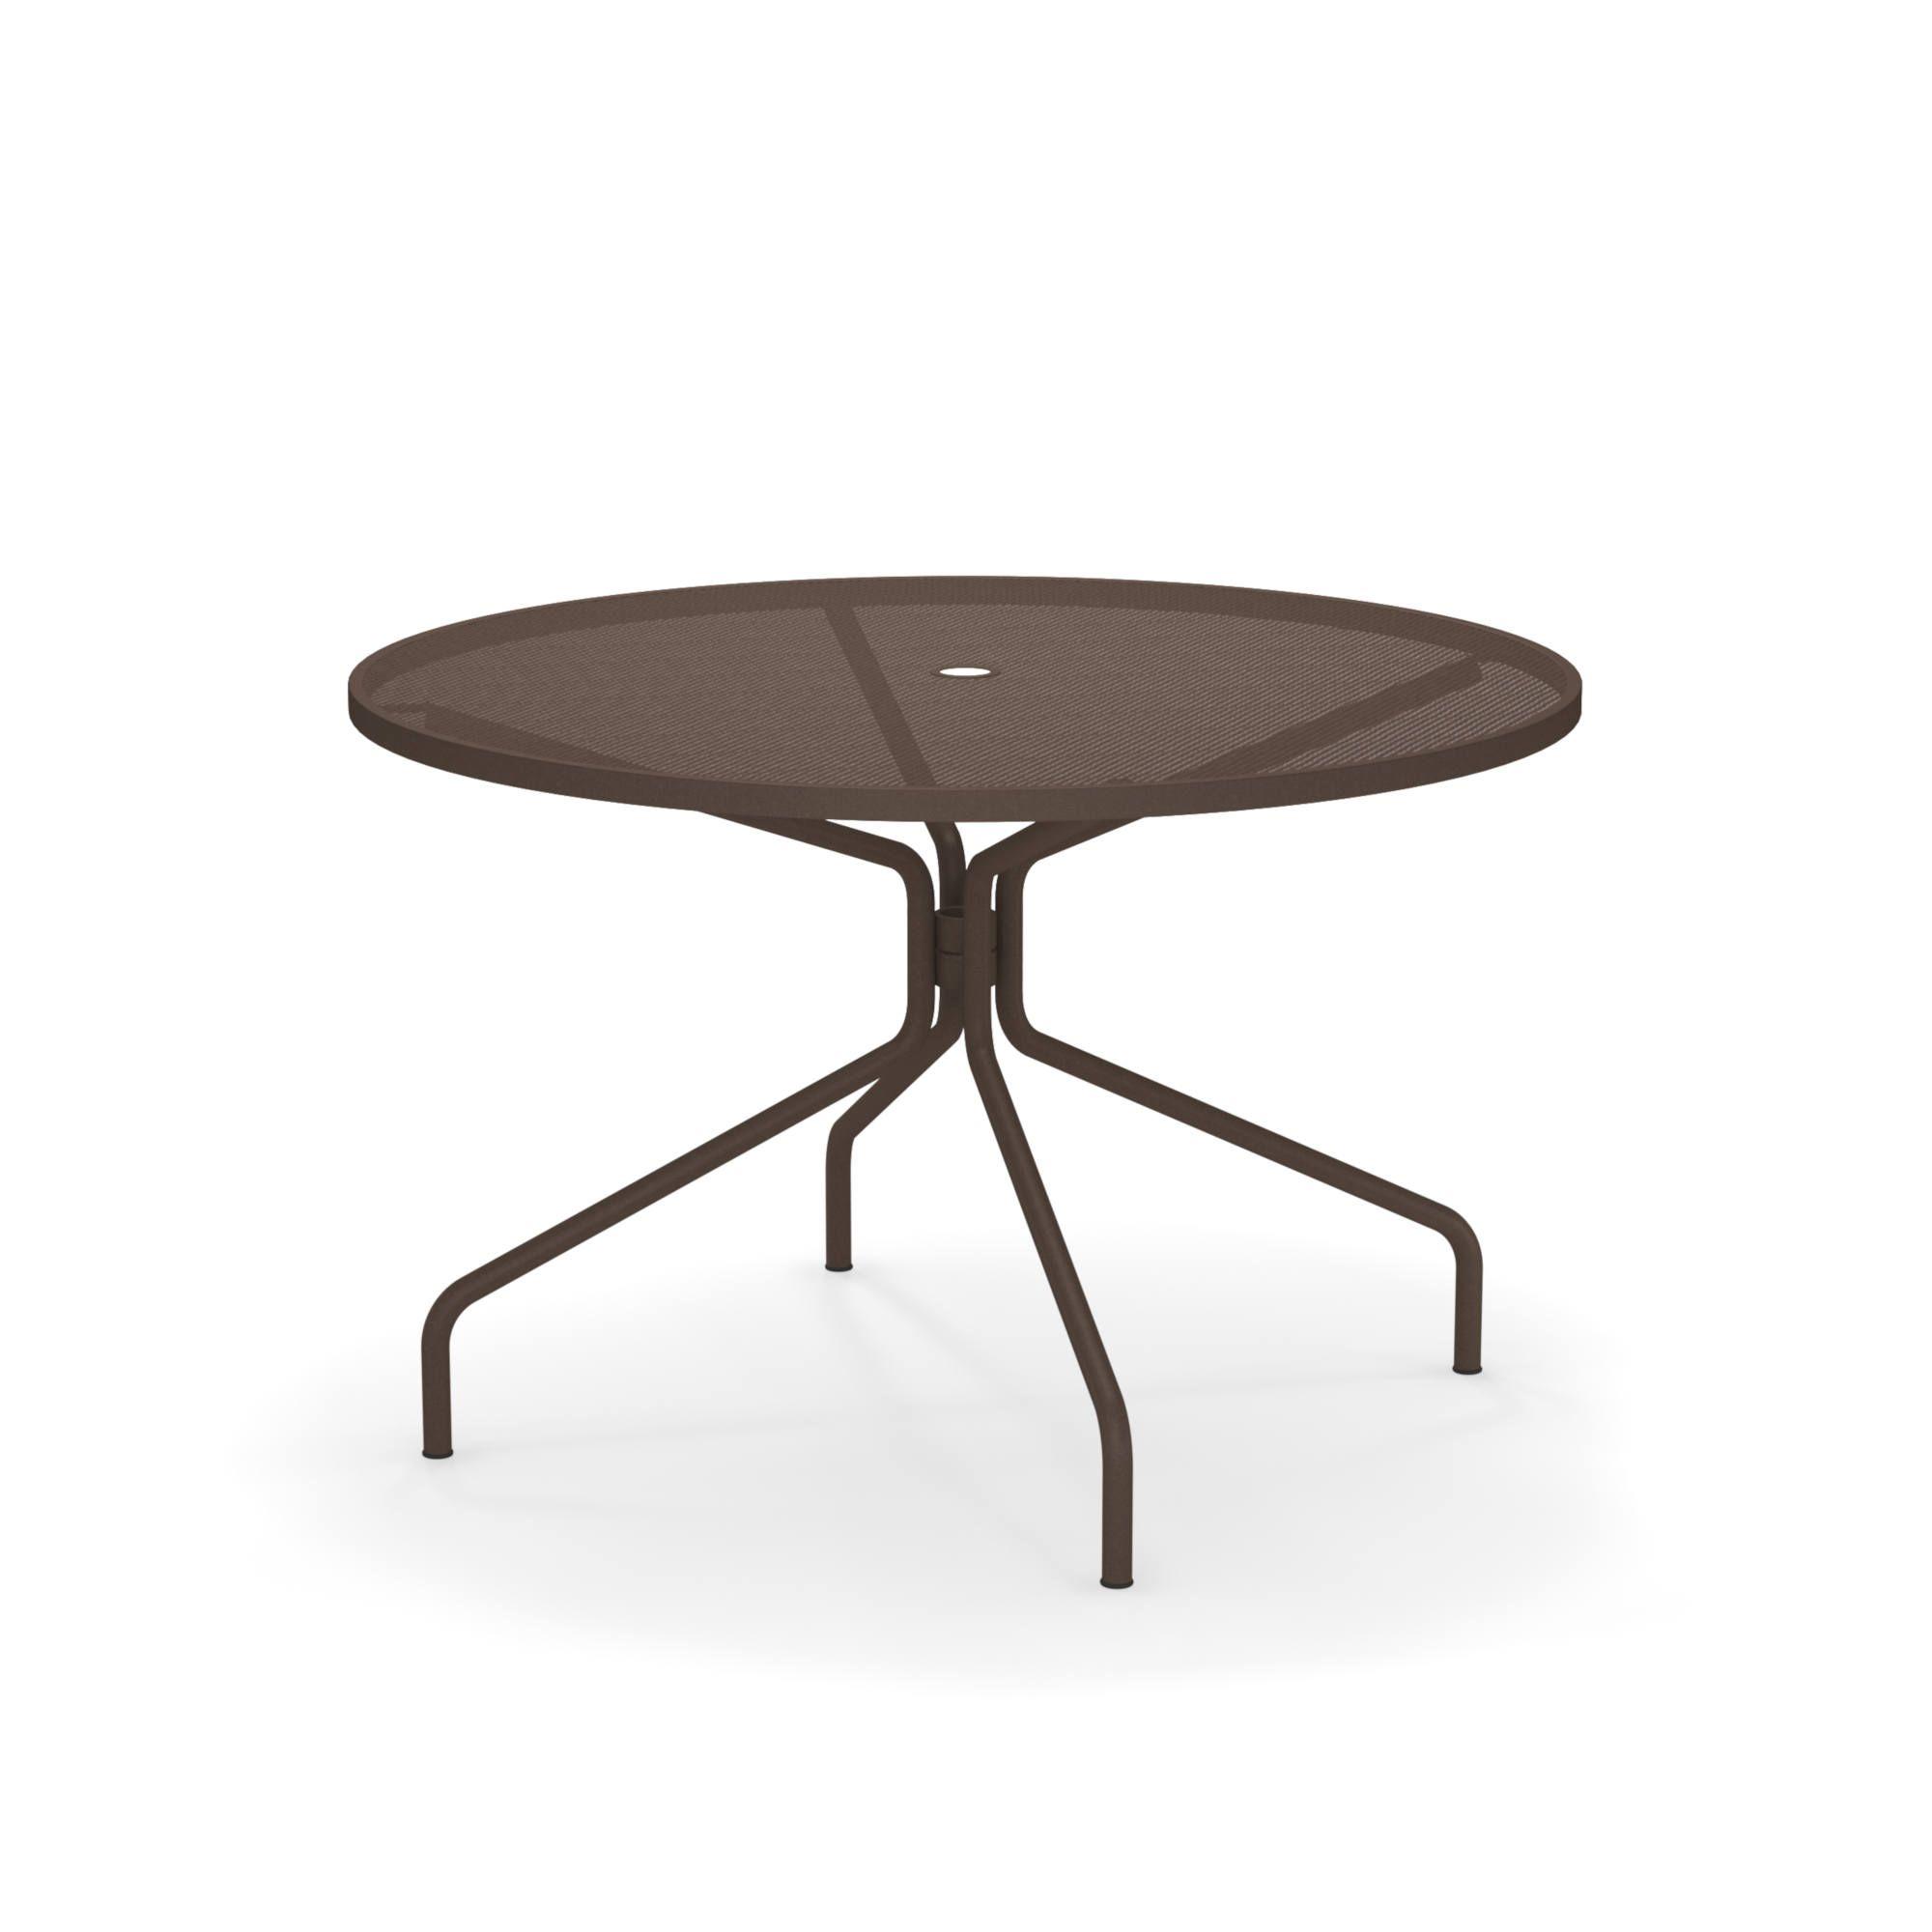 emuamericas, llc 805-41 table, outdoor